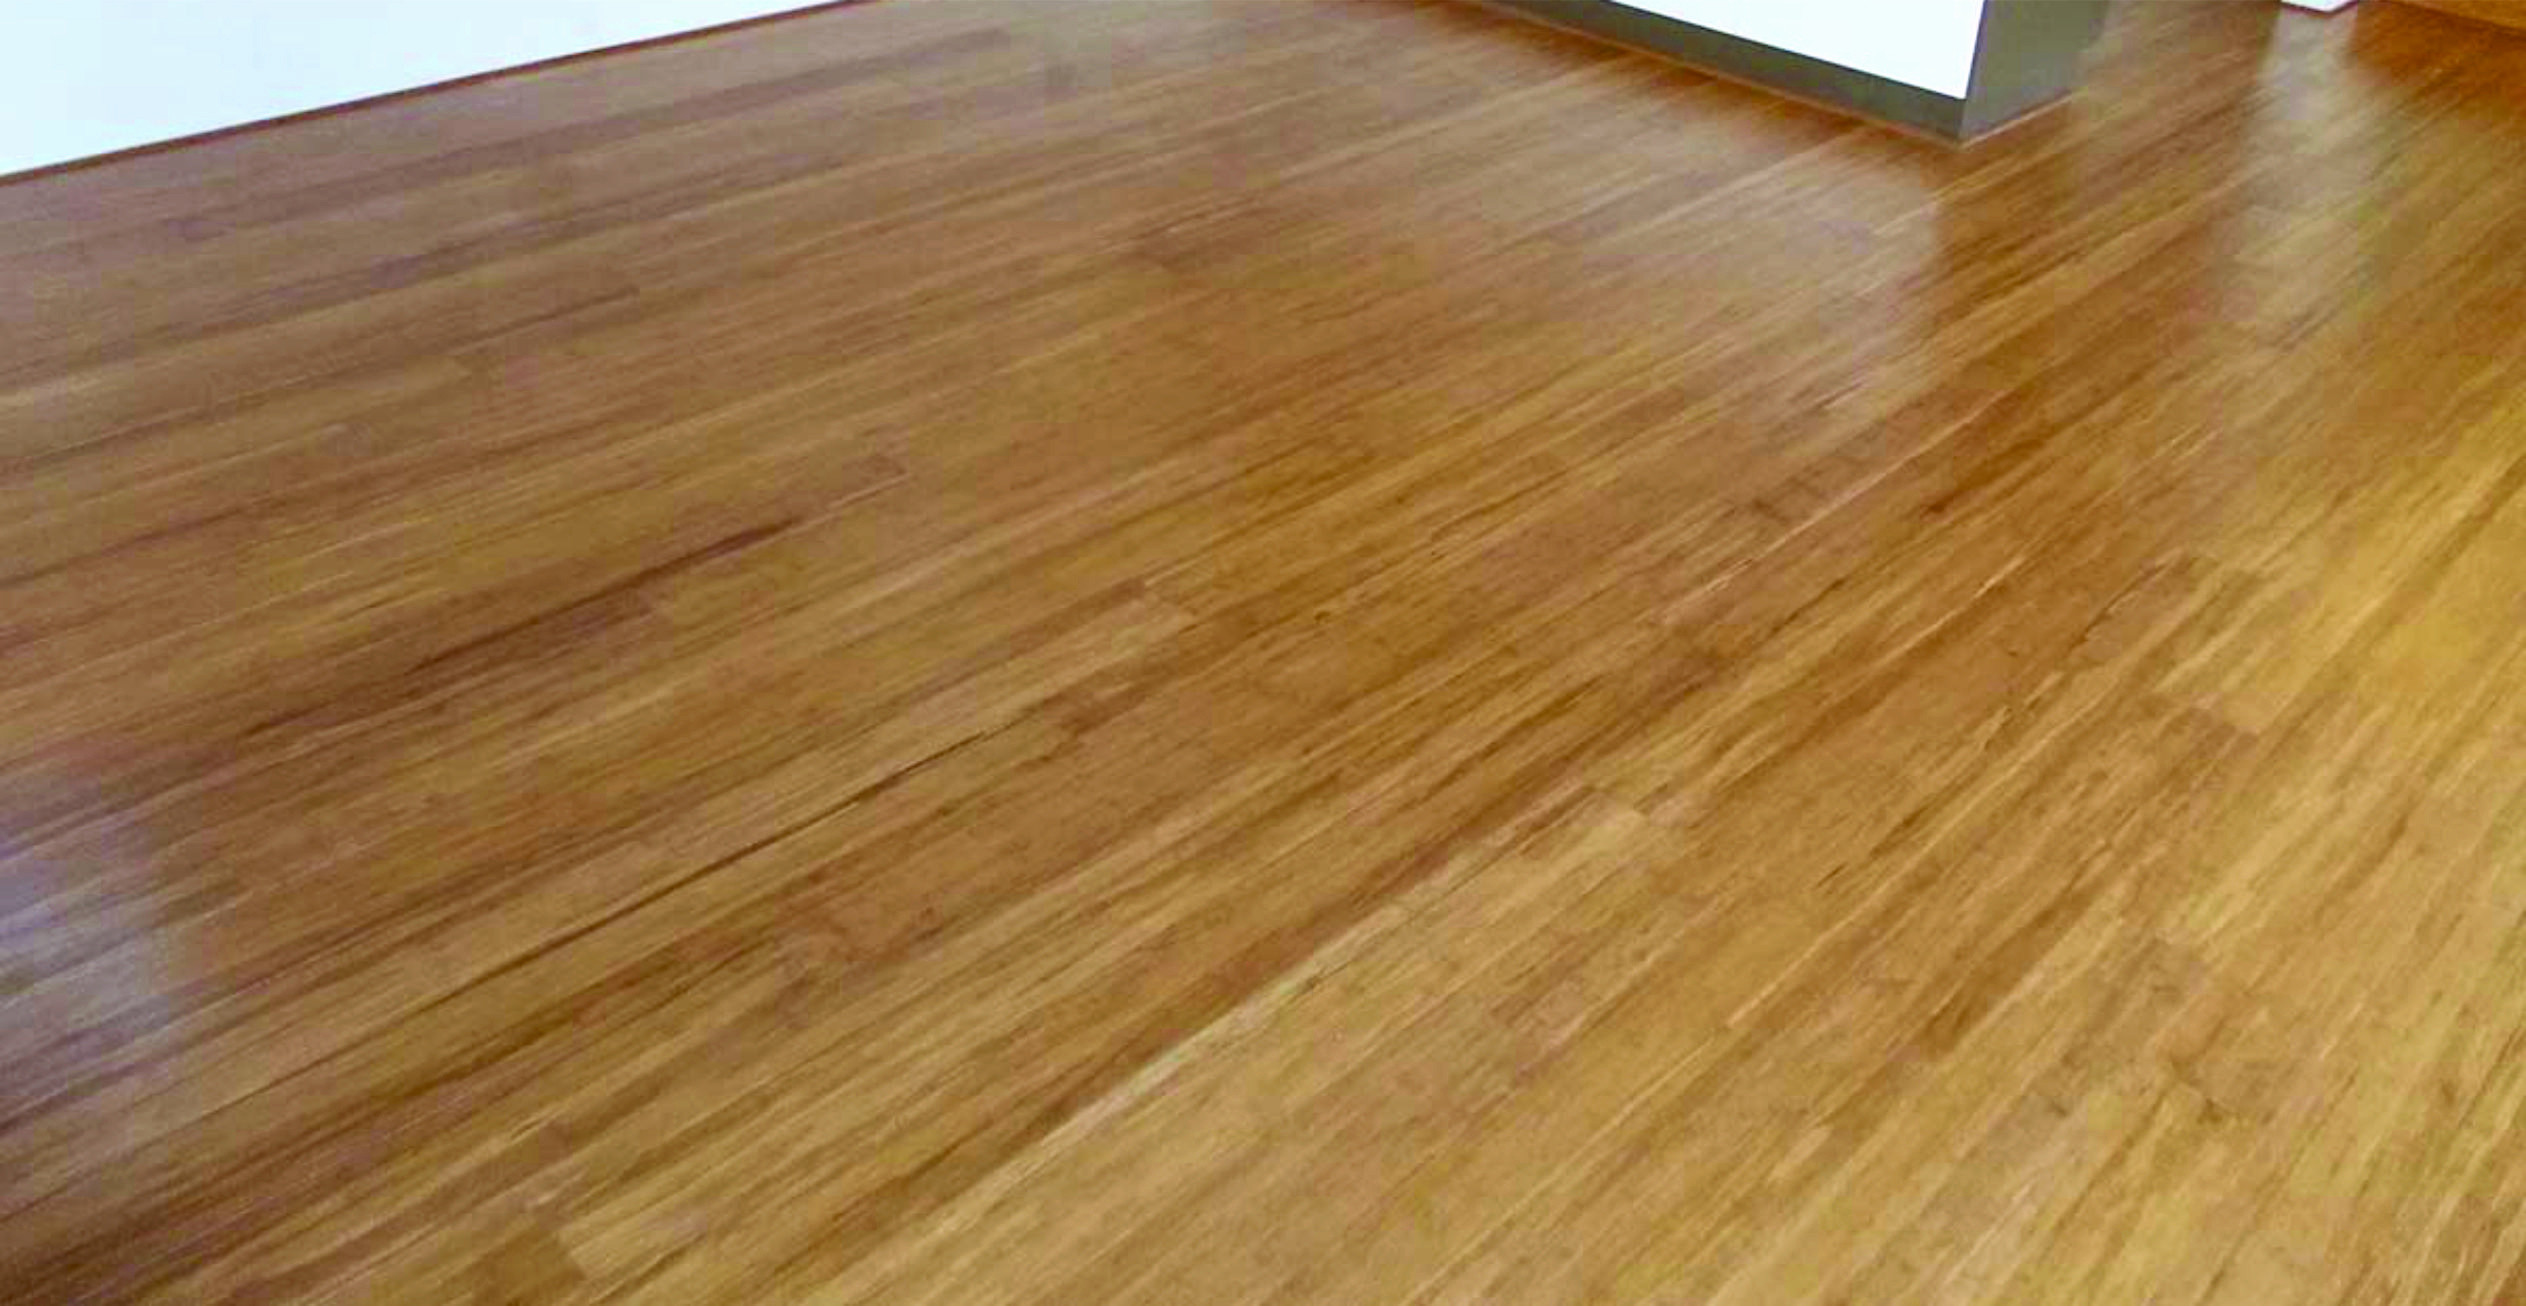 hardwood floor refinishing estimate costs of bamboo vs hardwood flooring floor regarding bamboo vs hardwood flooring 50 fresh estimated cost installing hardwood floors 50